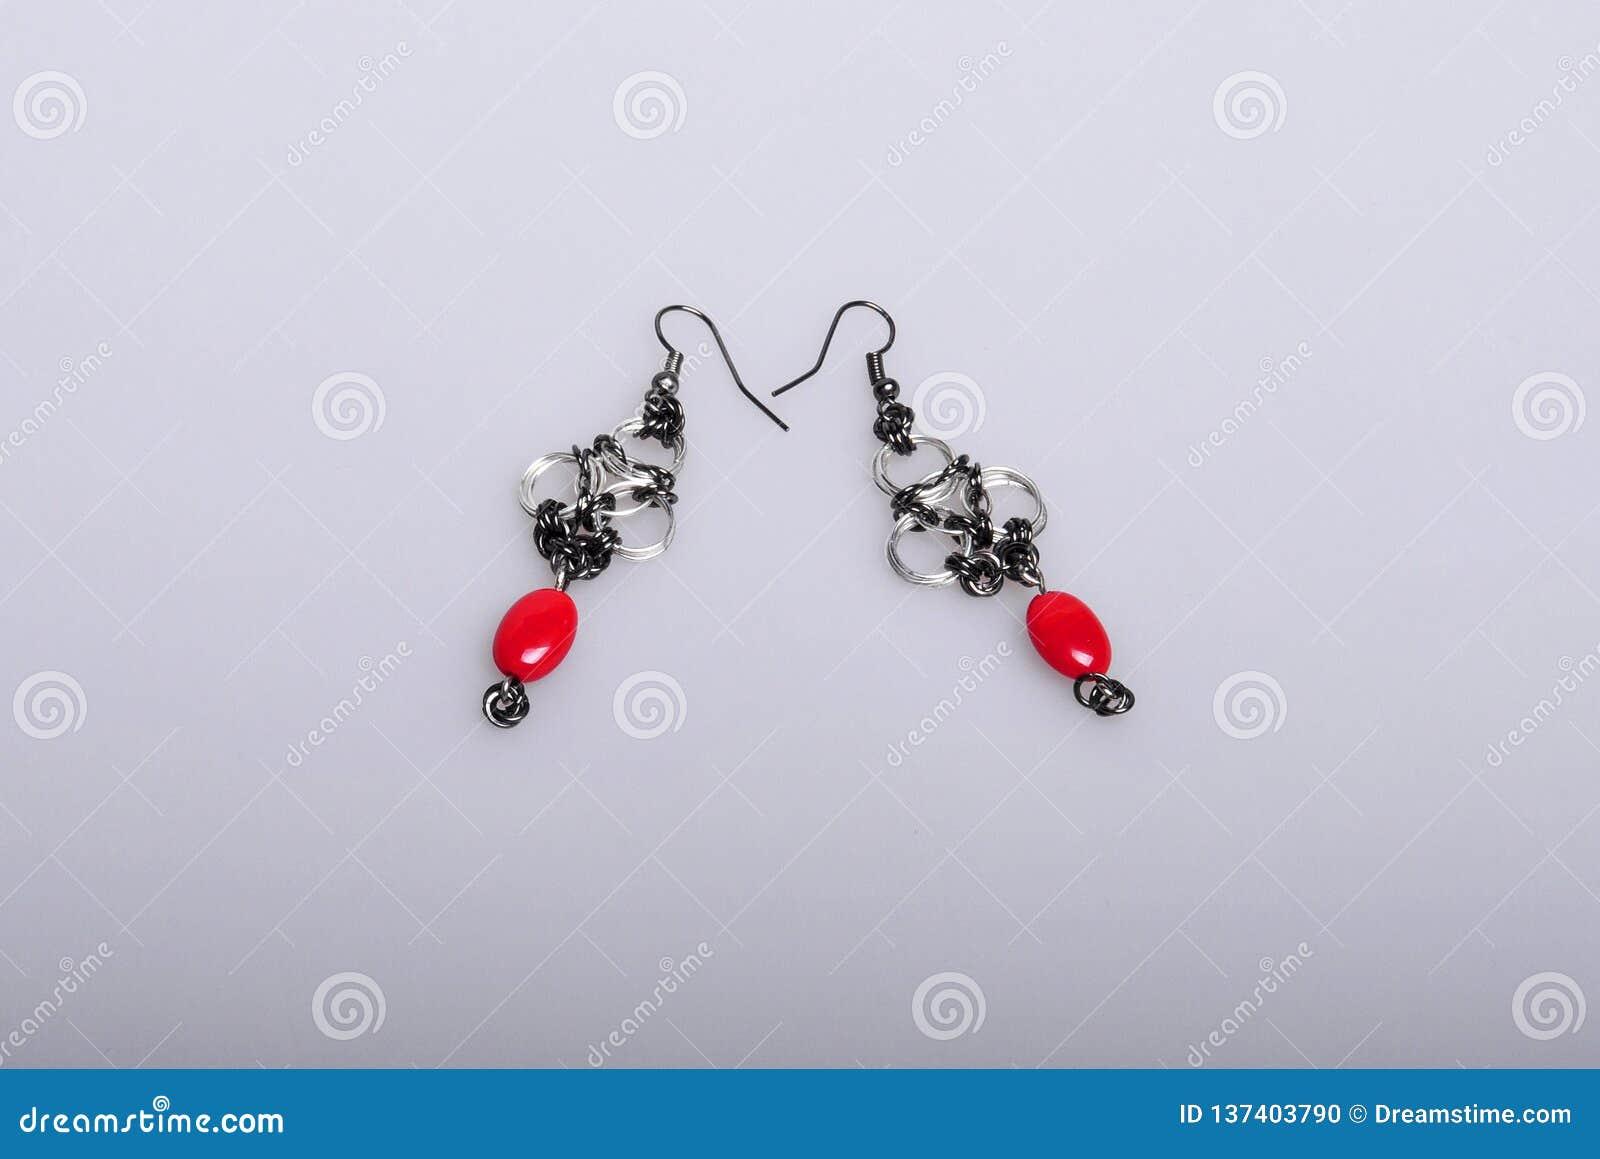 Handmade jewelry, pendant, earrings